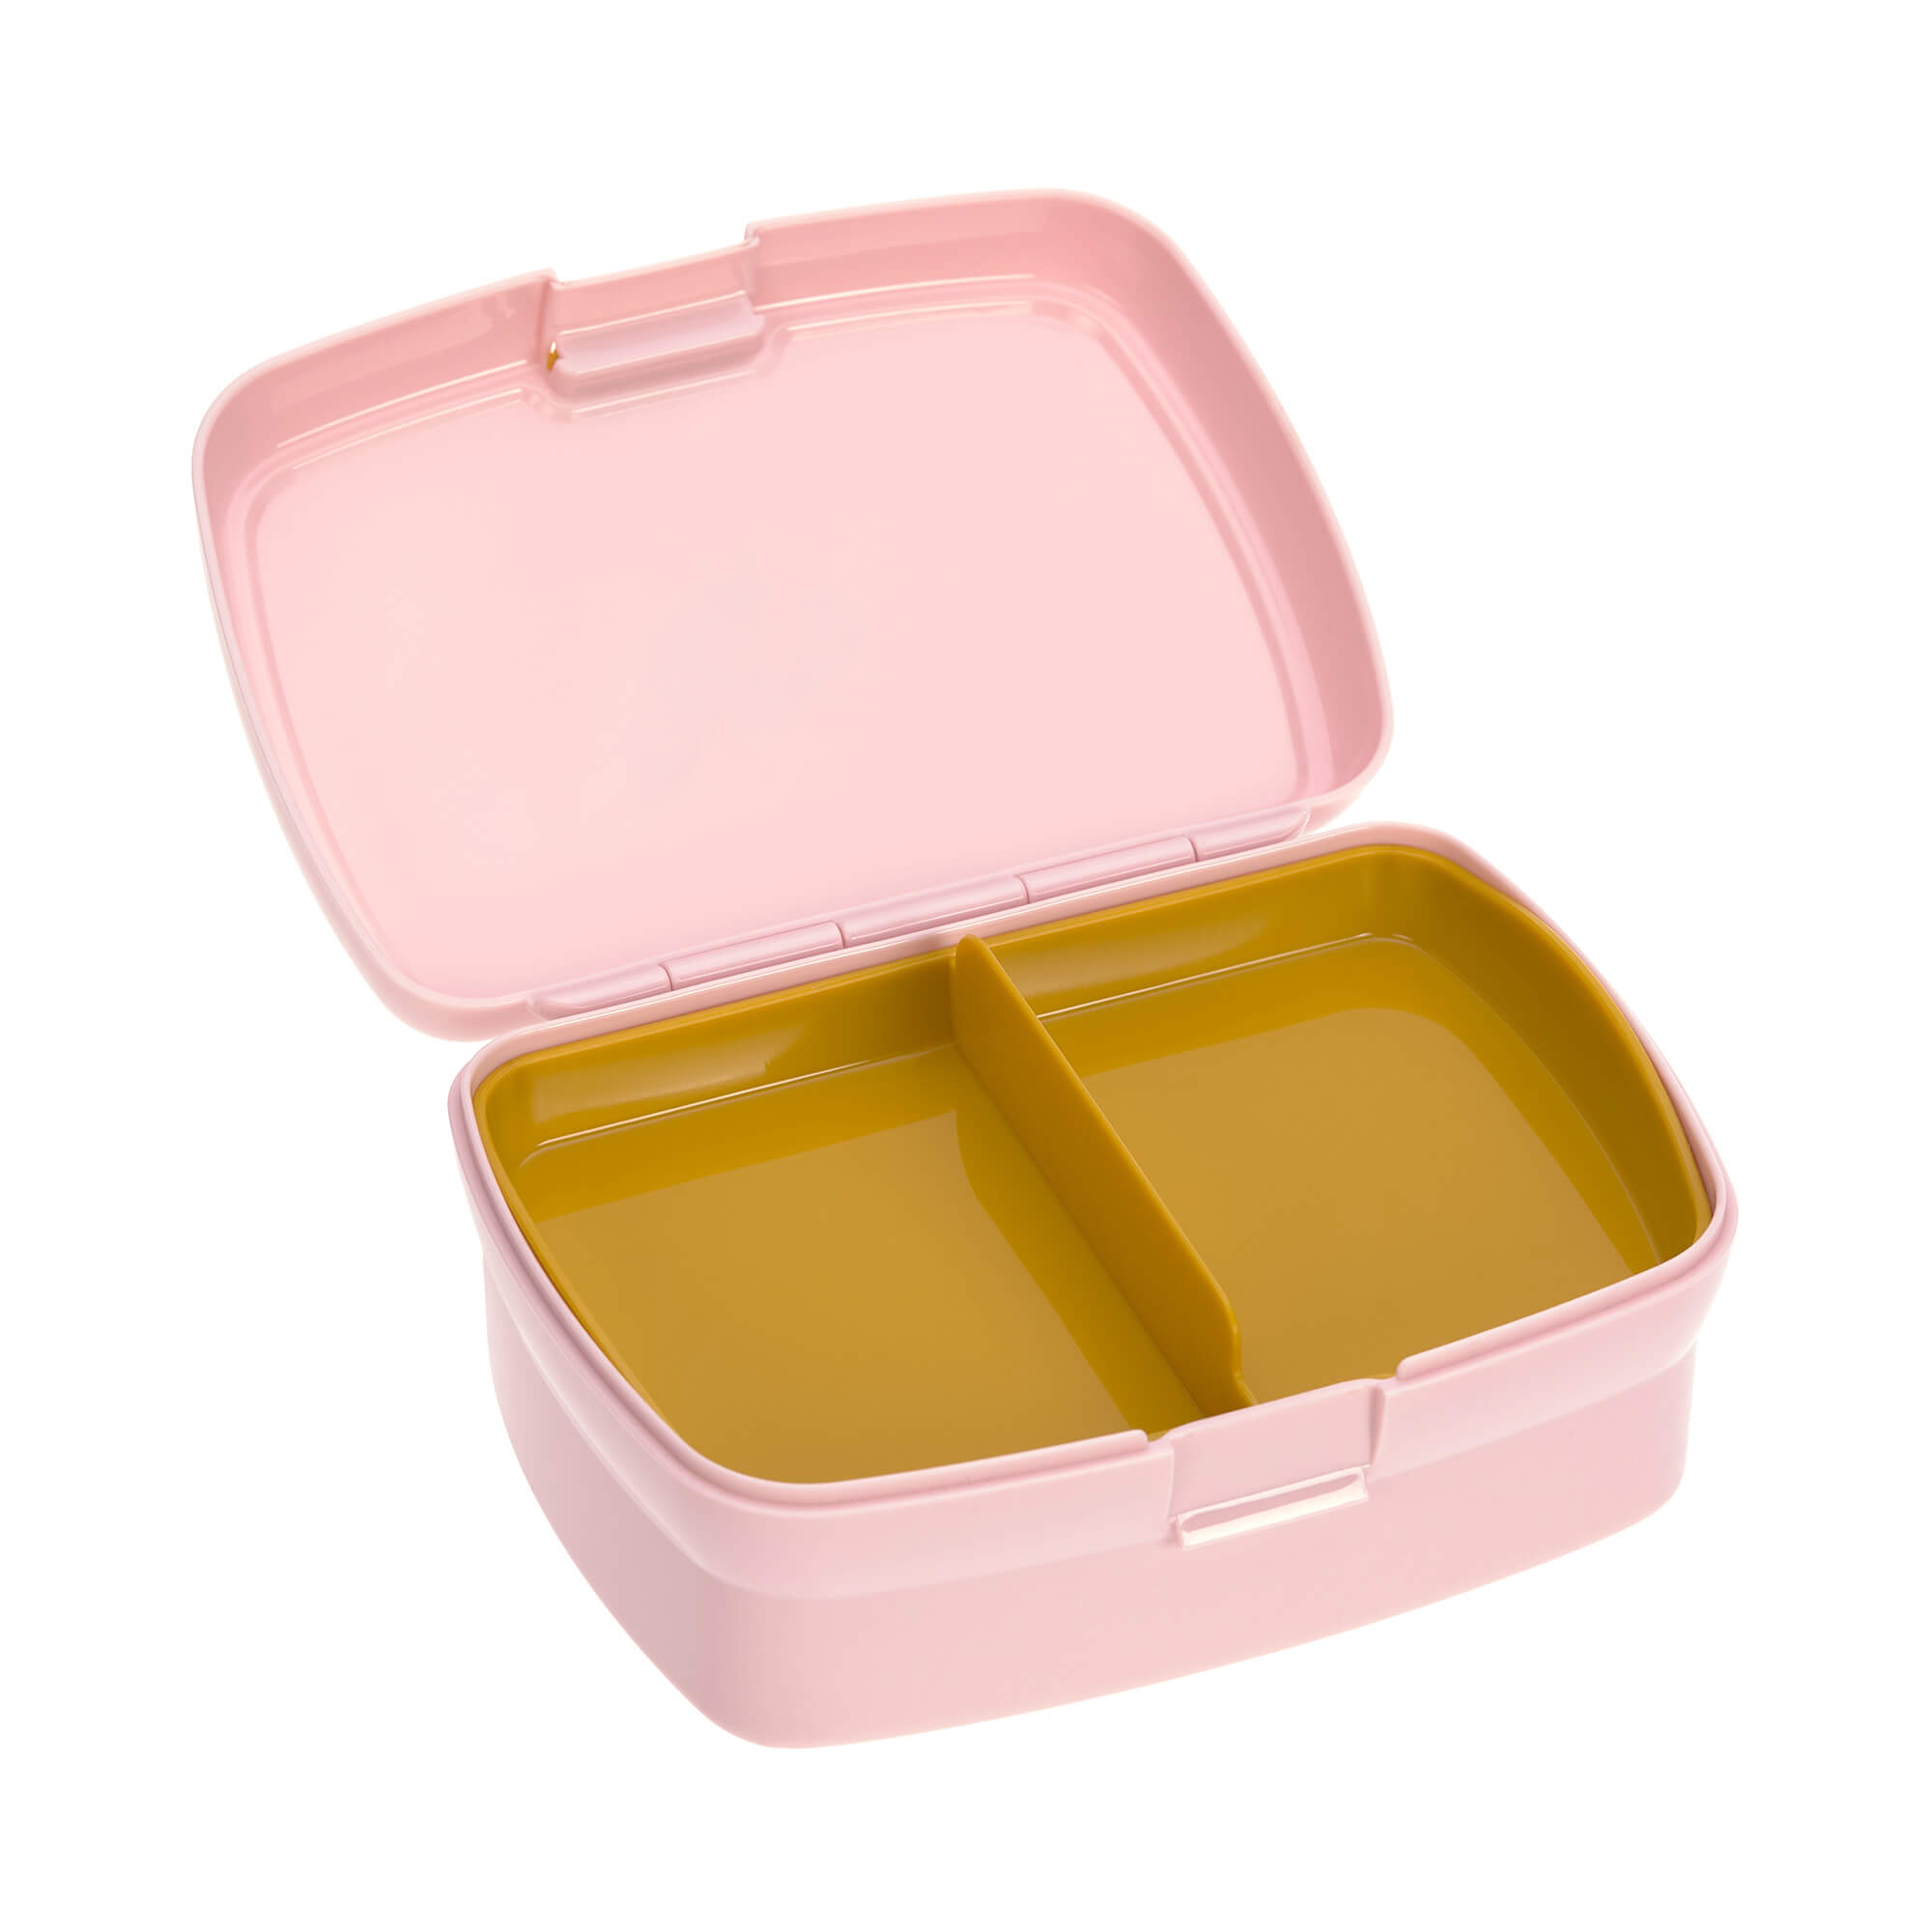 Kinder Brotdose - Lunchbox -  Adventure Tipi - Lässig